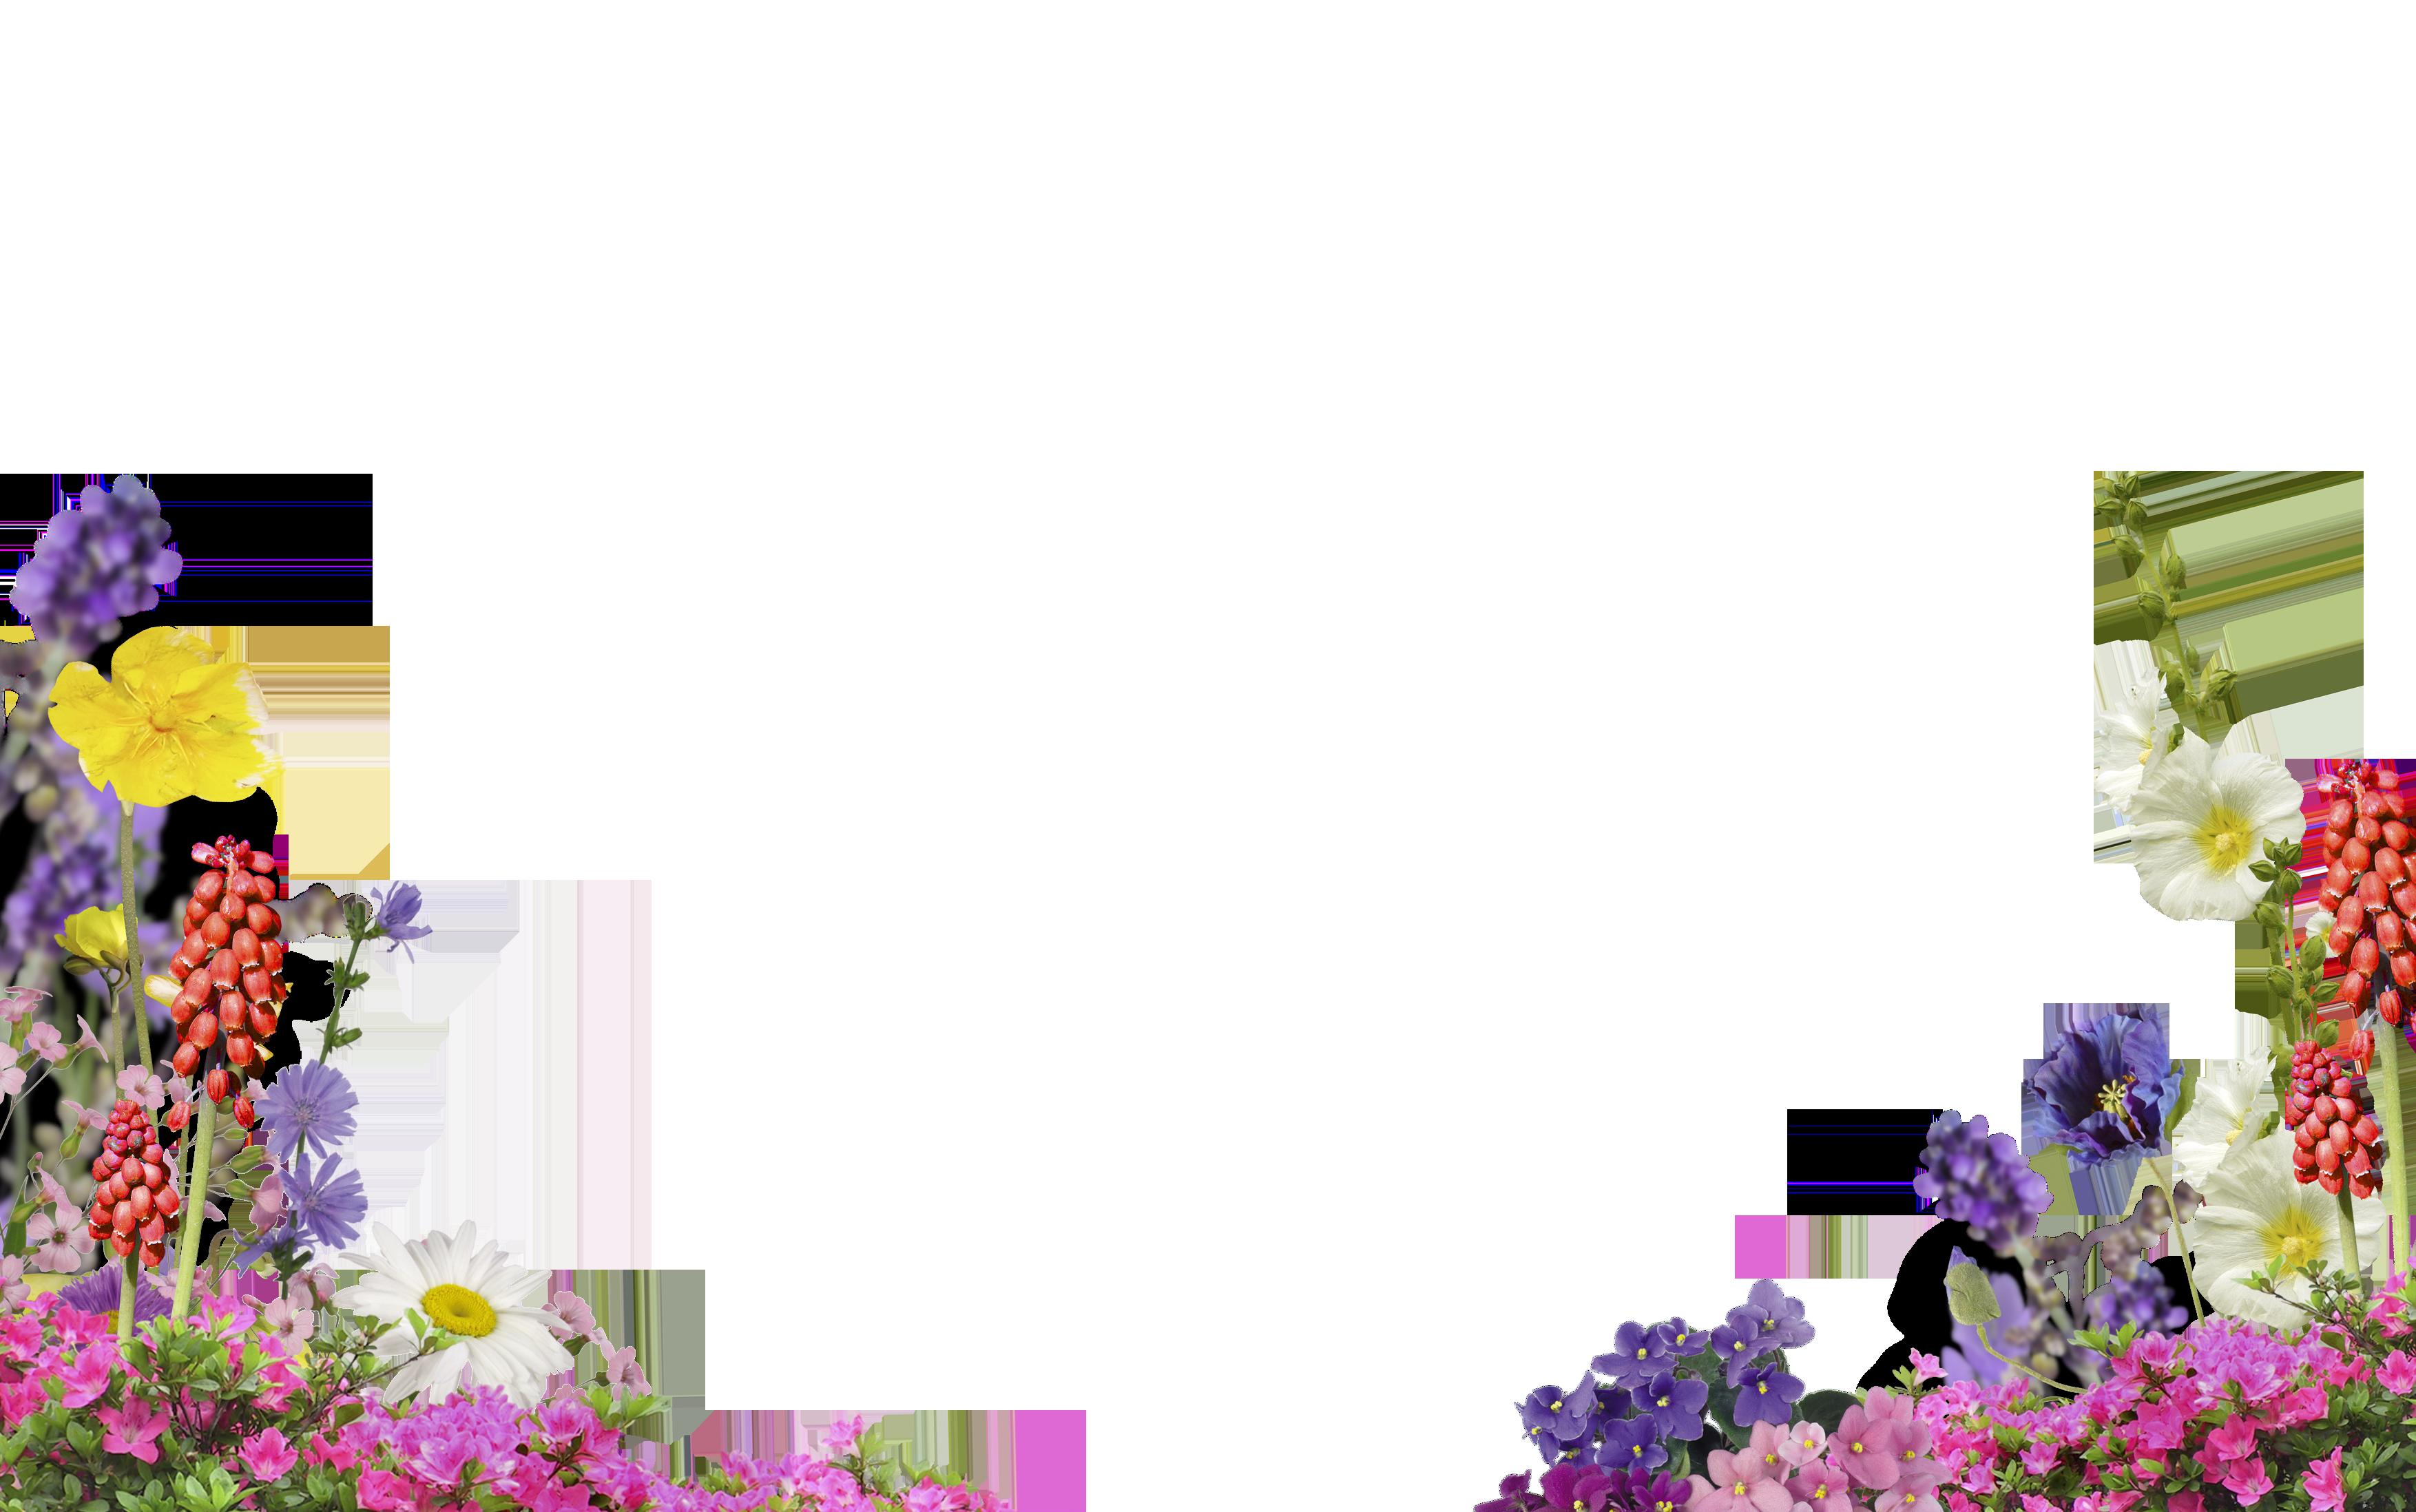 Free Flower Photo Overlay Photoshop Overlays From Mroverlay Photo Overlays Photoshop Backgrounds Free Flower Photos